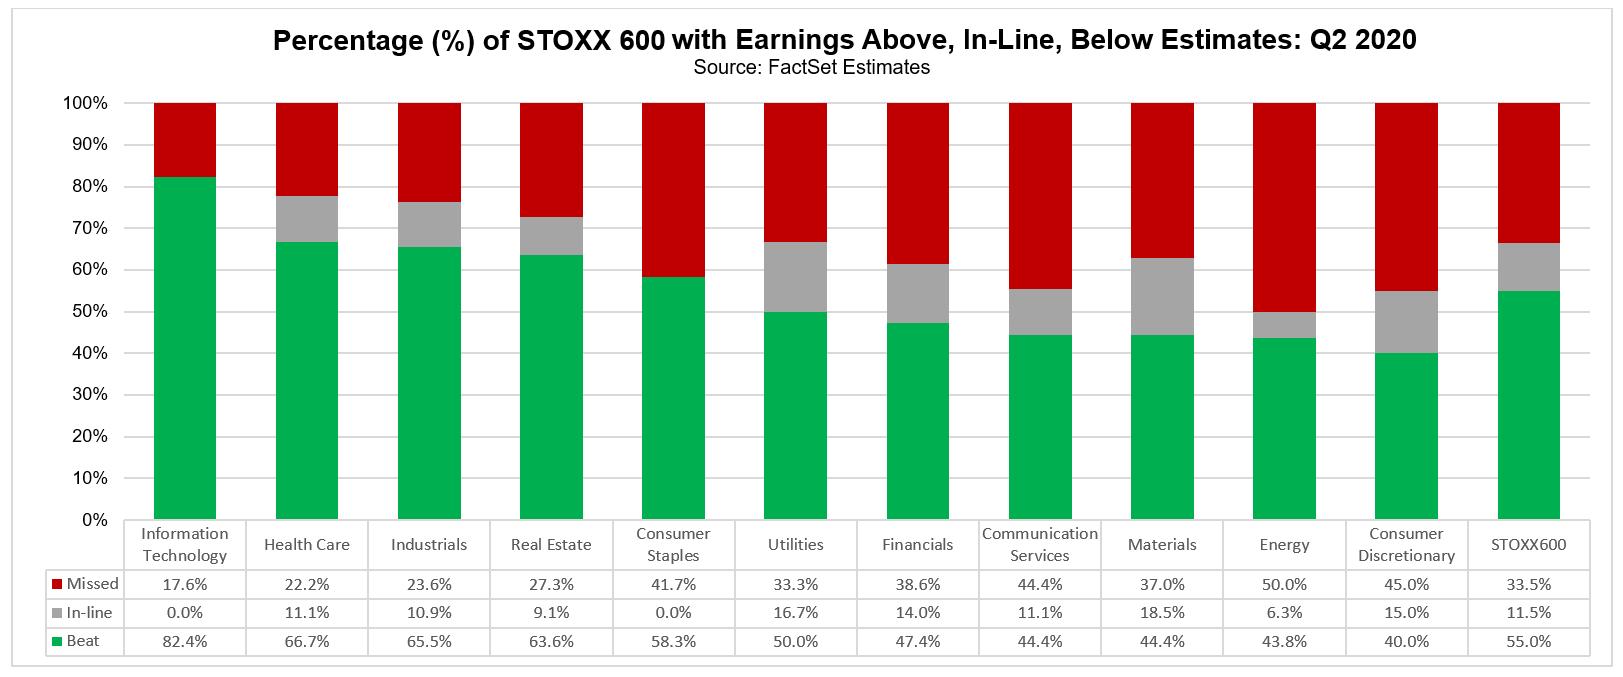 STOXX 600 cos earnings above inline below estimates Q2 2020